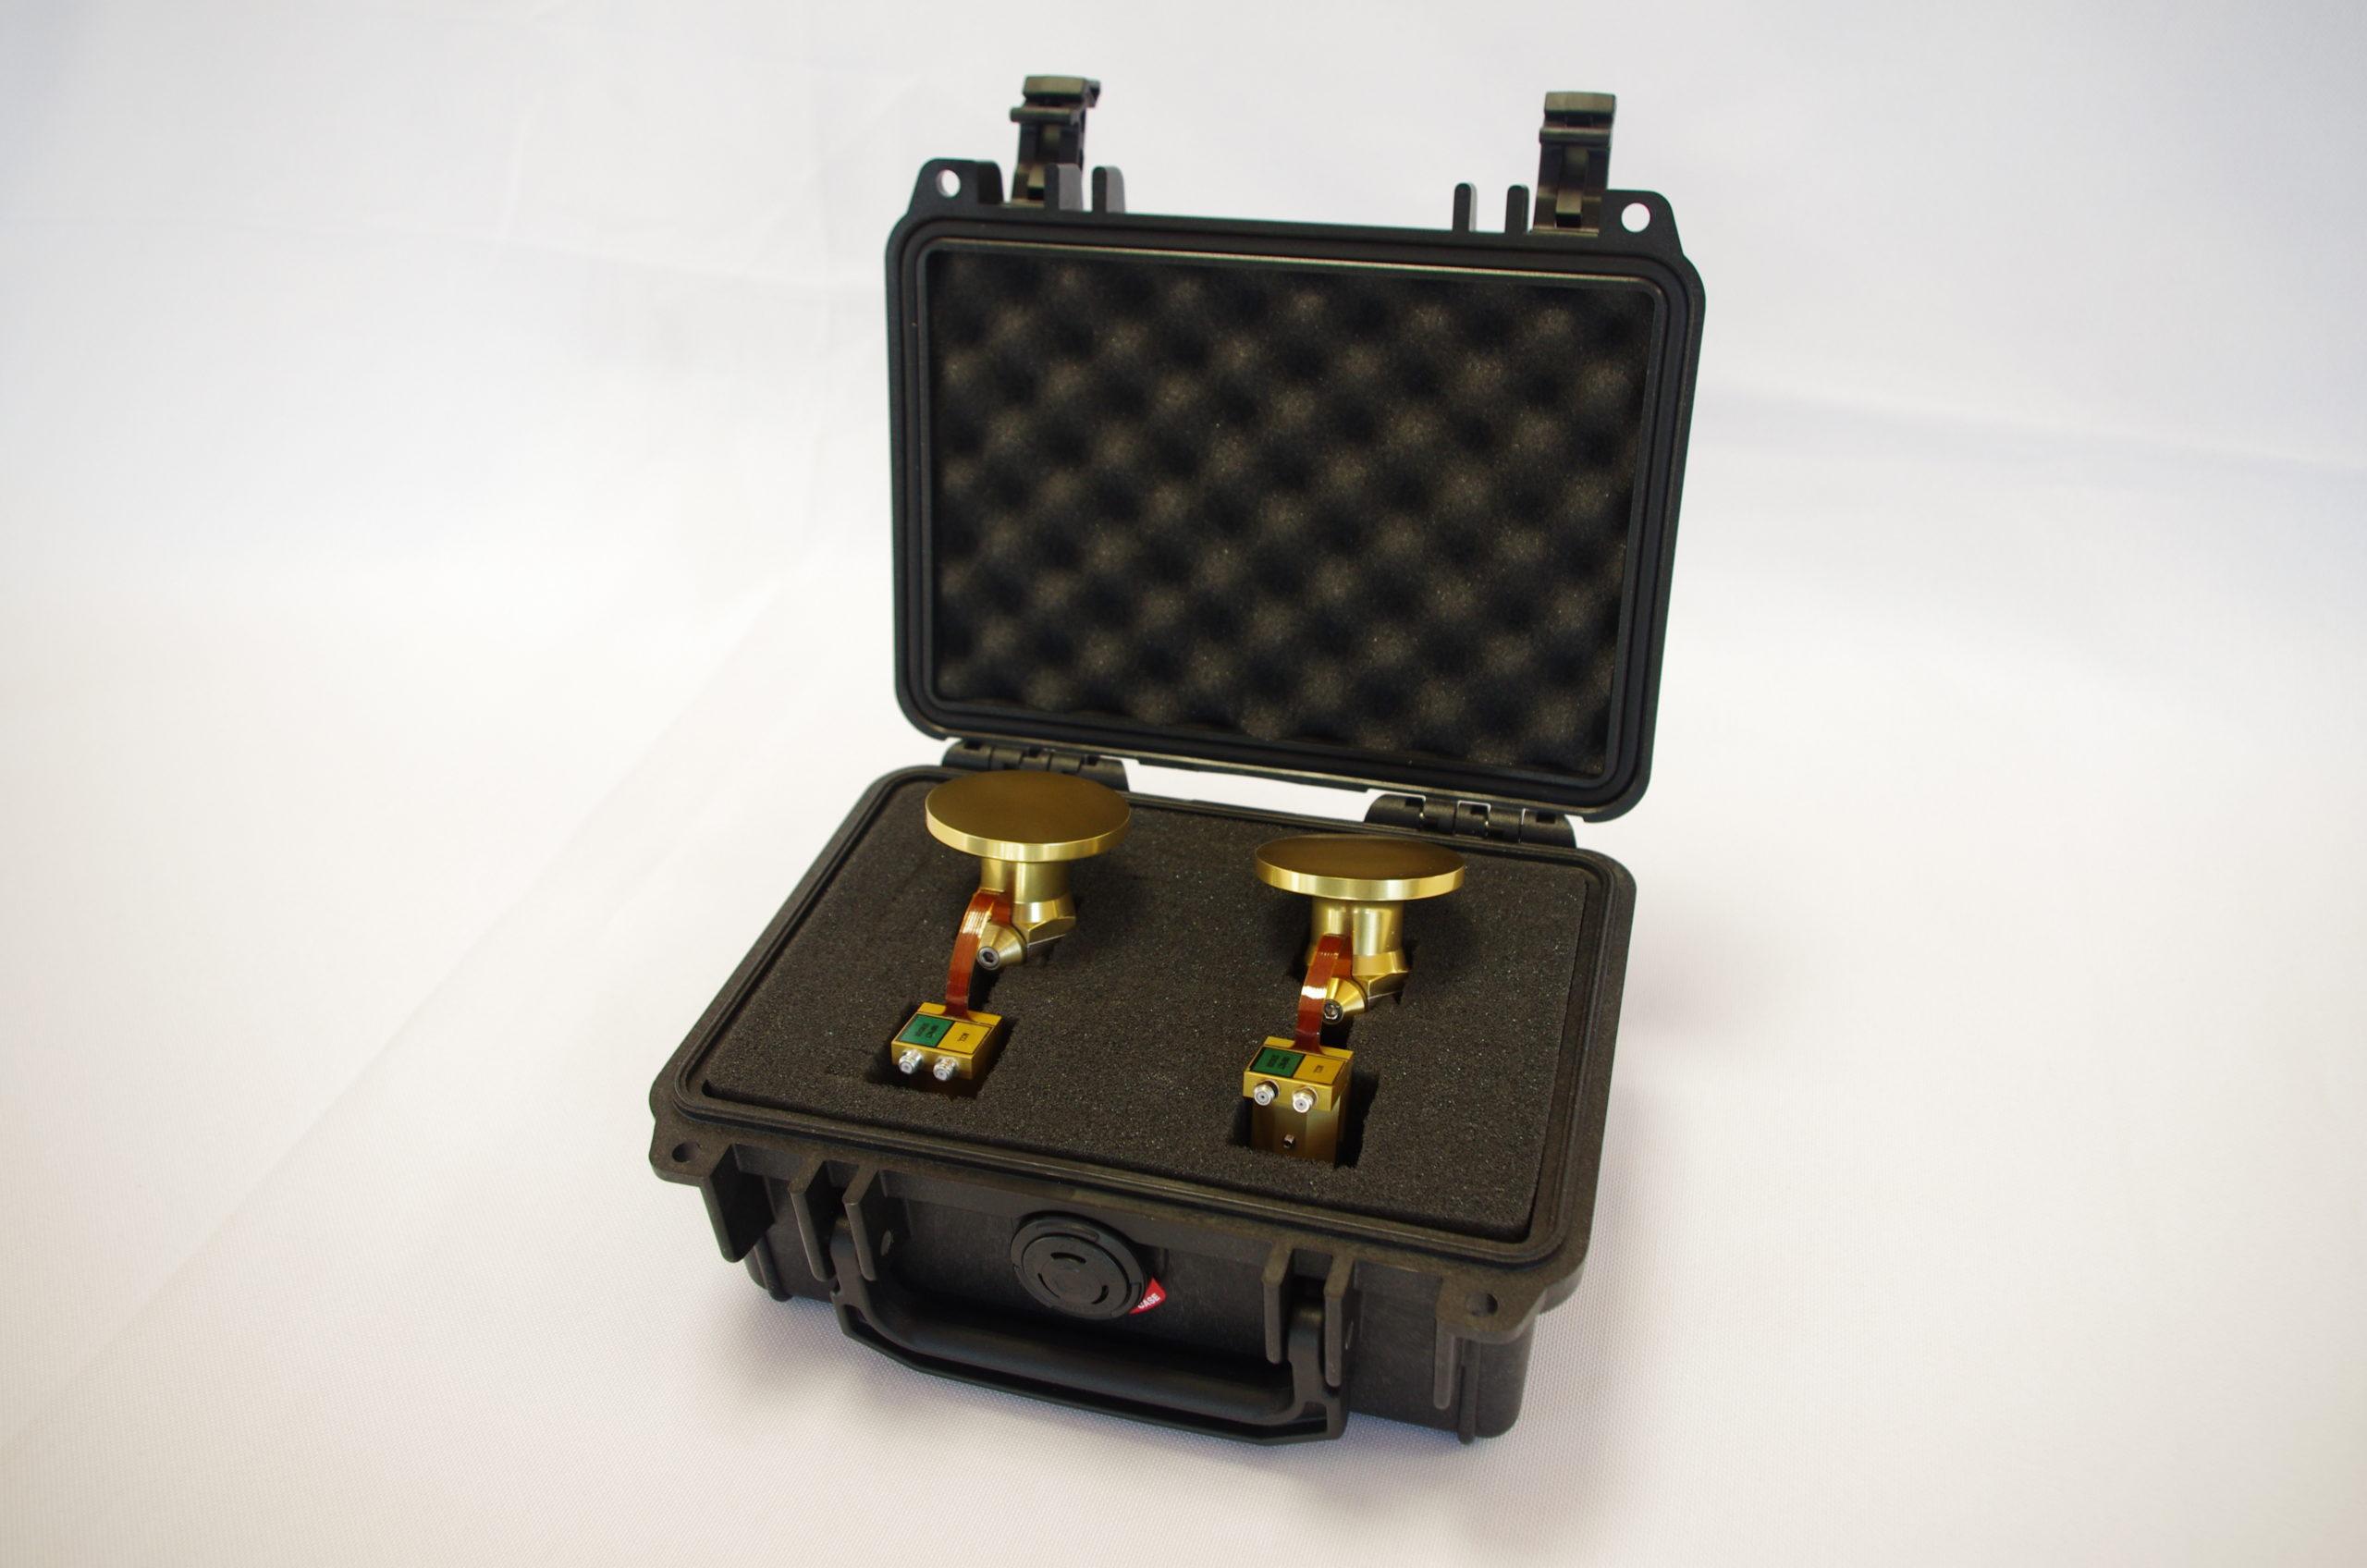 PIND sensor calibration